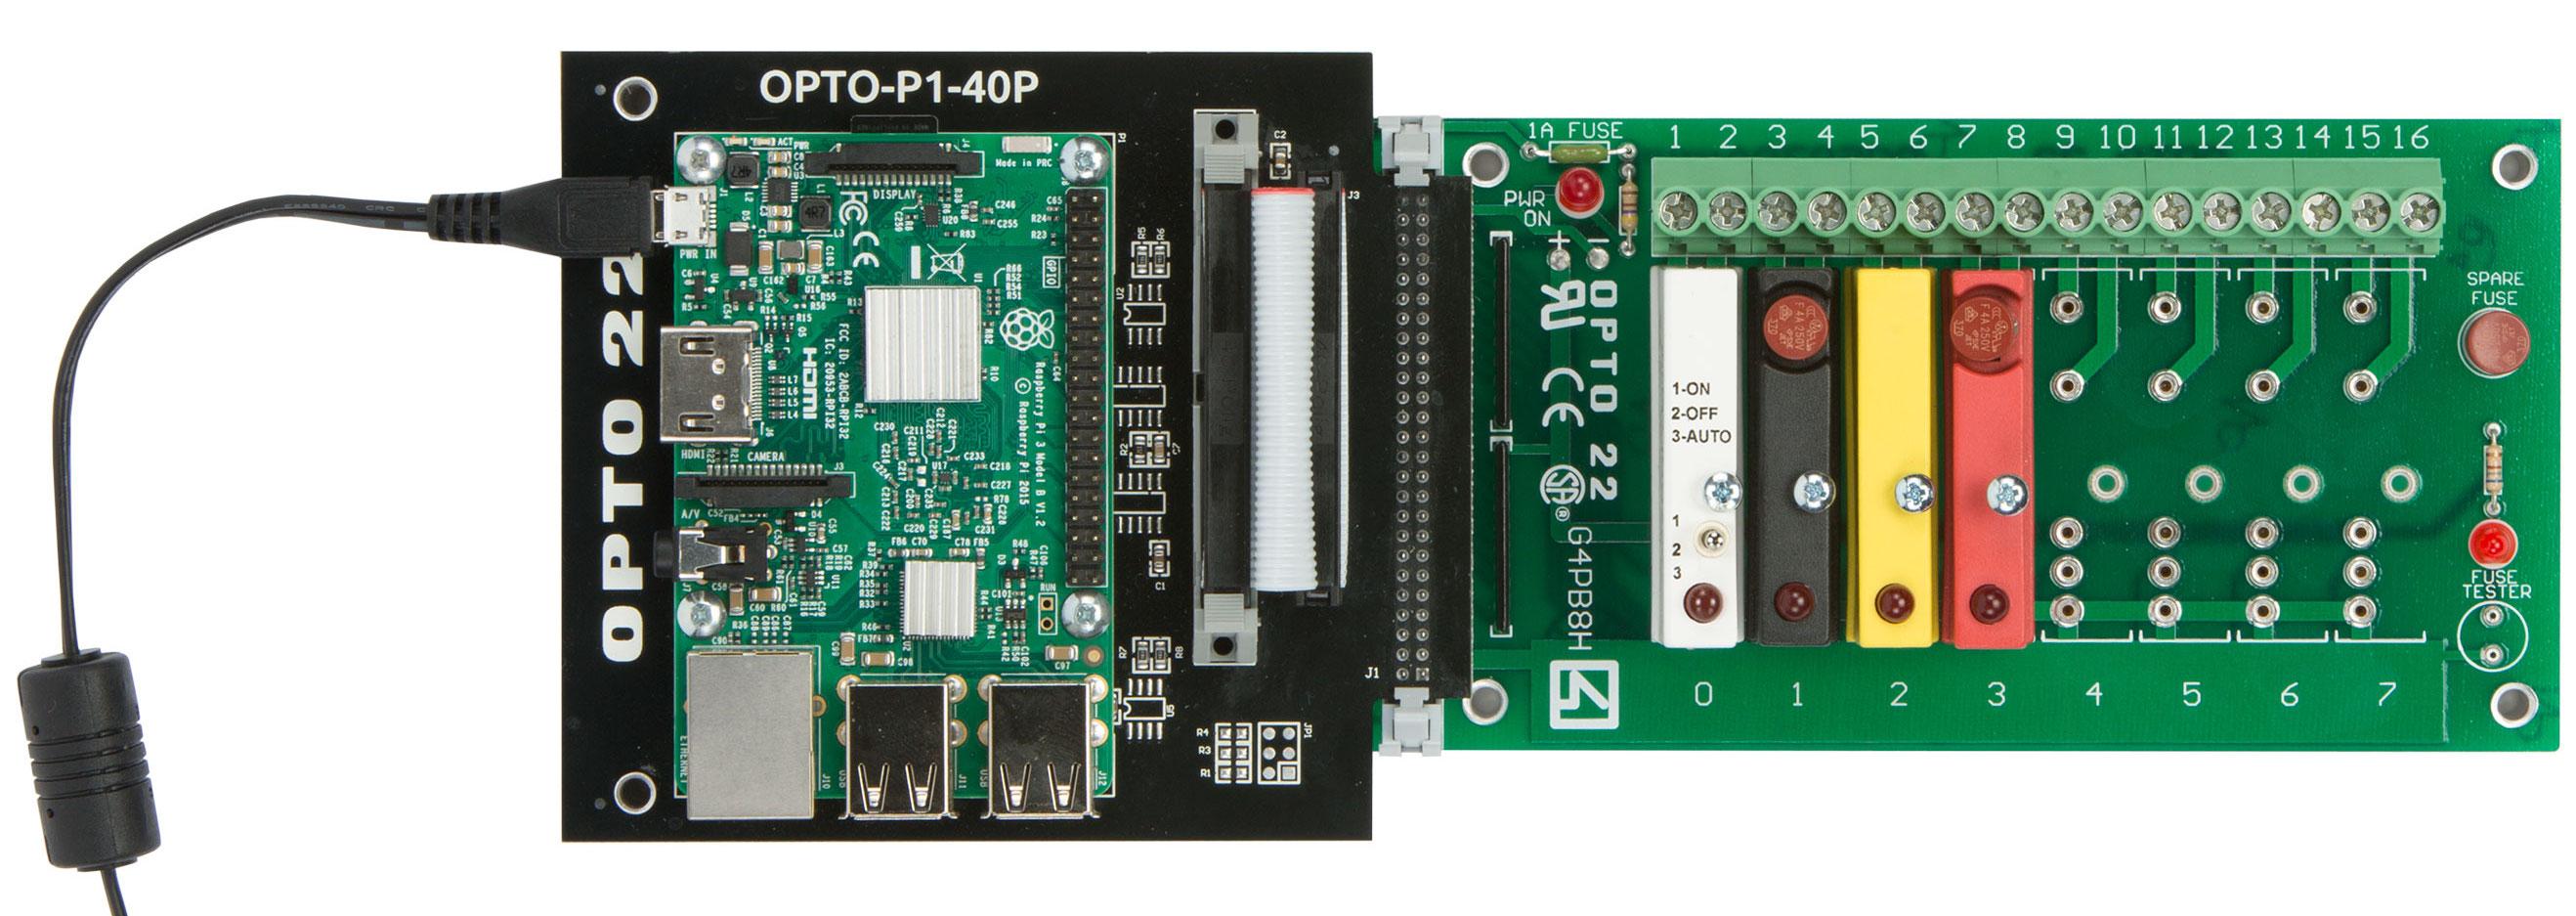 Assembled-raspberry-pi-digital-io-starter-kit-with-power.jpg